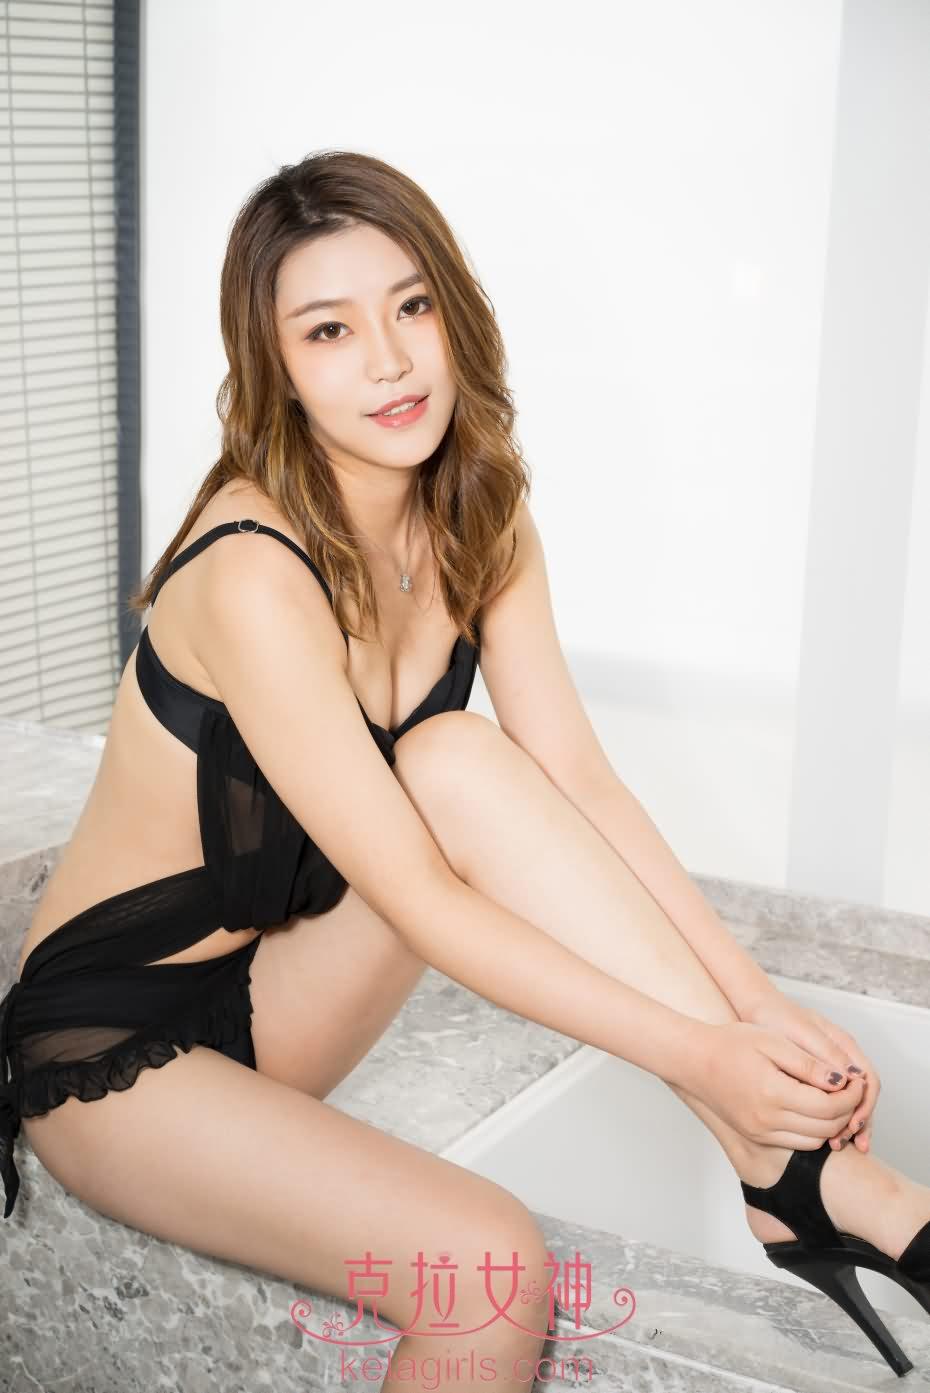 [Kelagirls克拉女神] 浴室挑逗 橙橙 2017-08-25 [24+1P-393M]